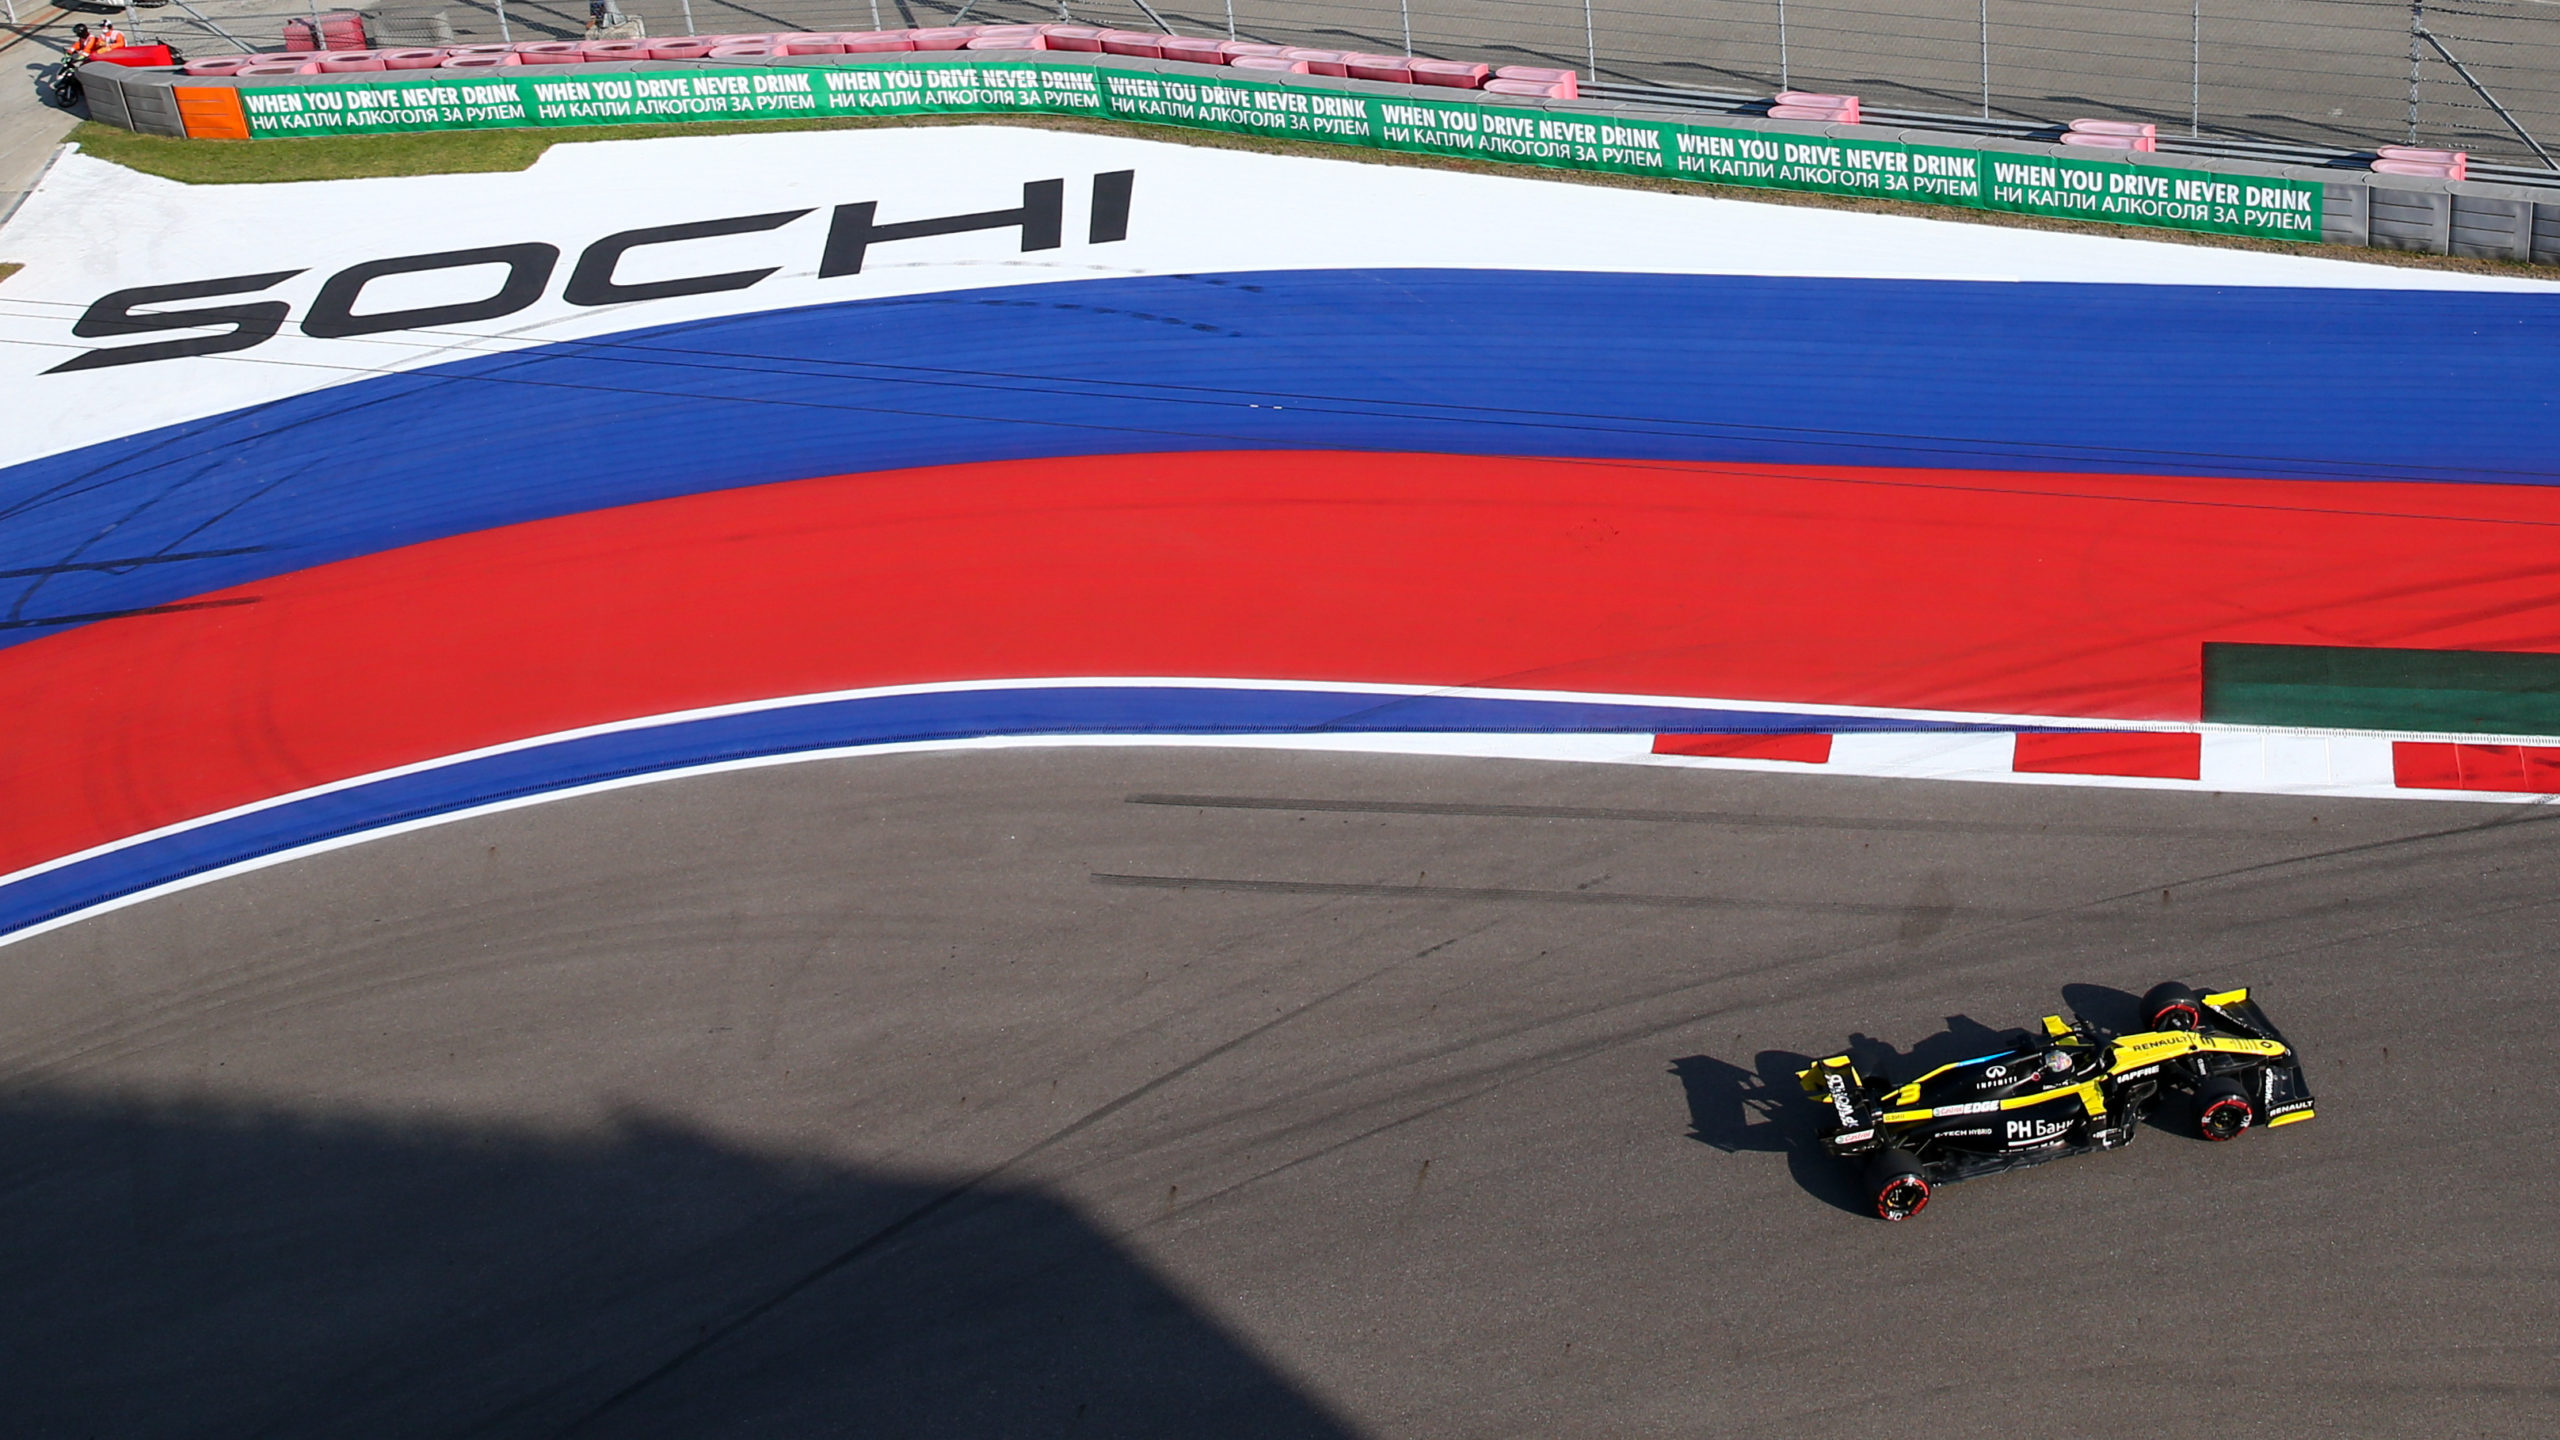 F1 Russian Grand Prix Hamilton 4th on grid Lando Norris first Ever pole!